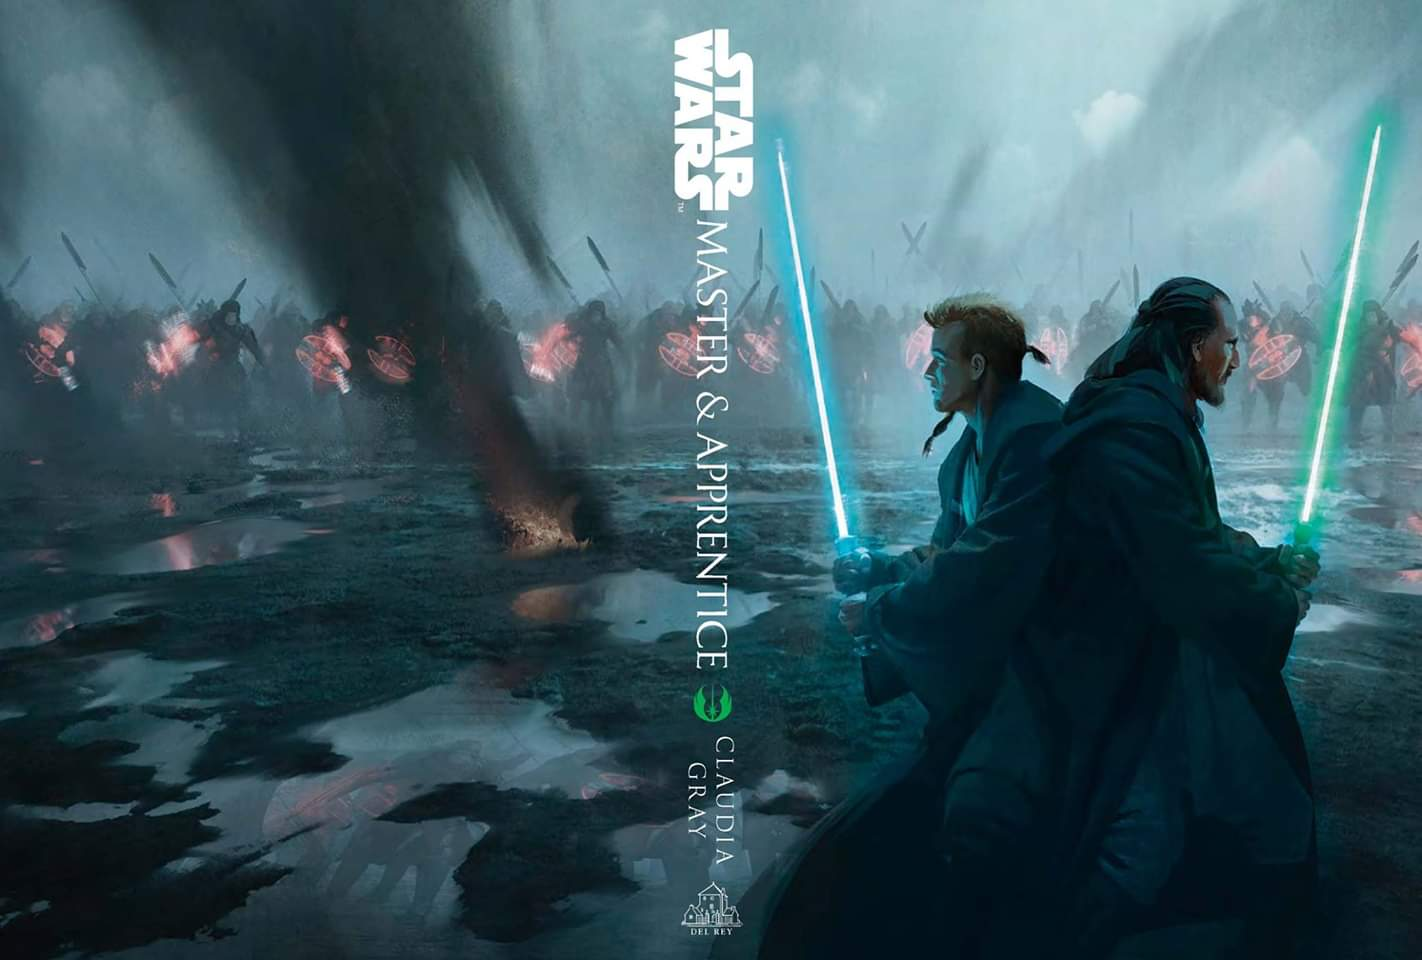 Master & Apprentice SWCC Exclusive Cover